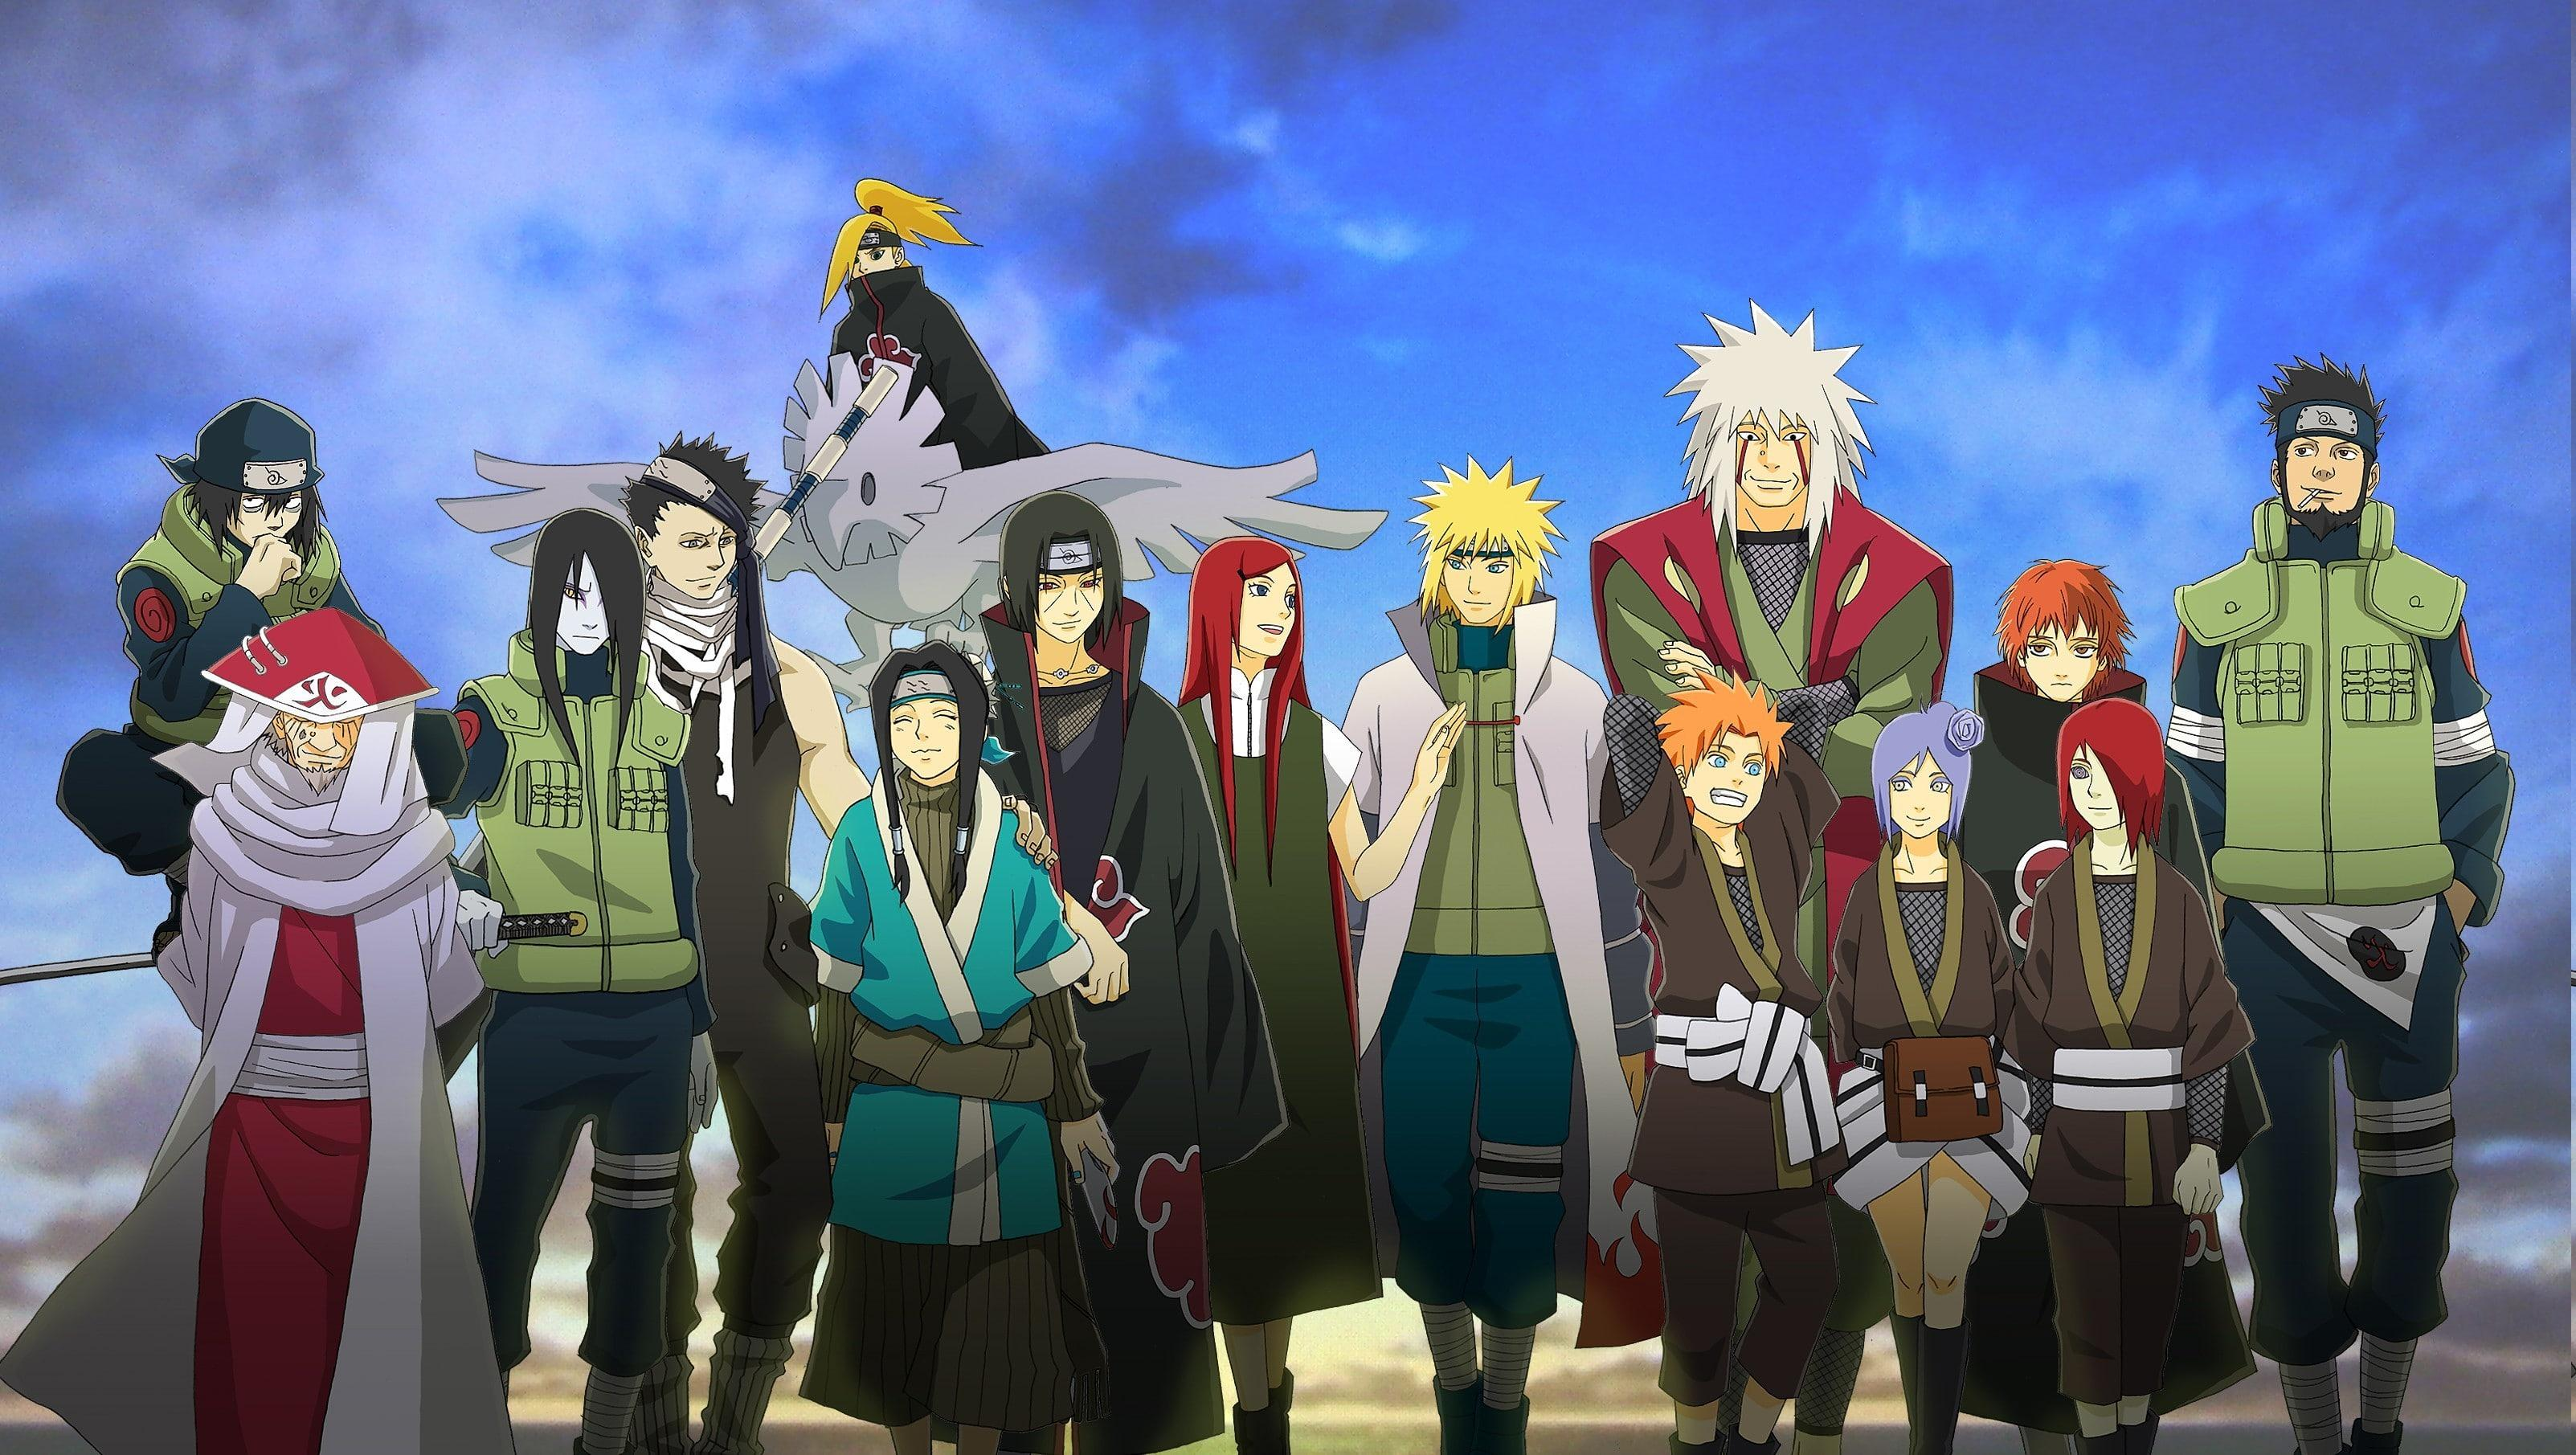 Naruto Characters Wallpaper Posted By Sarah Sellers